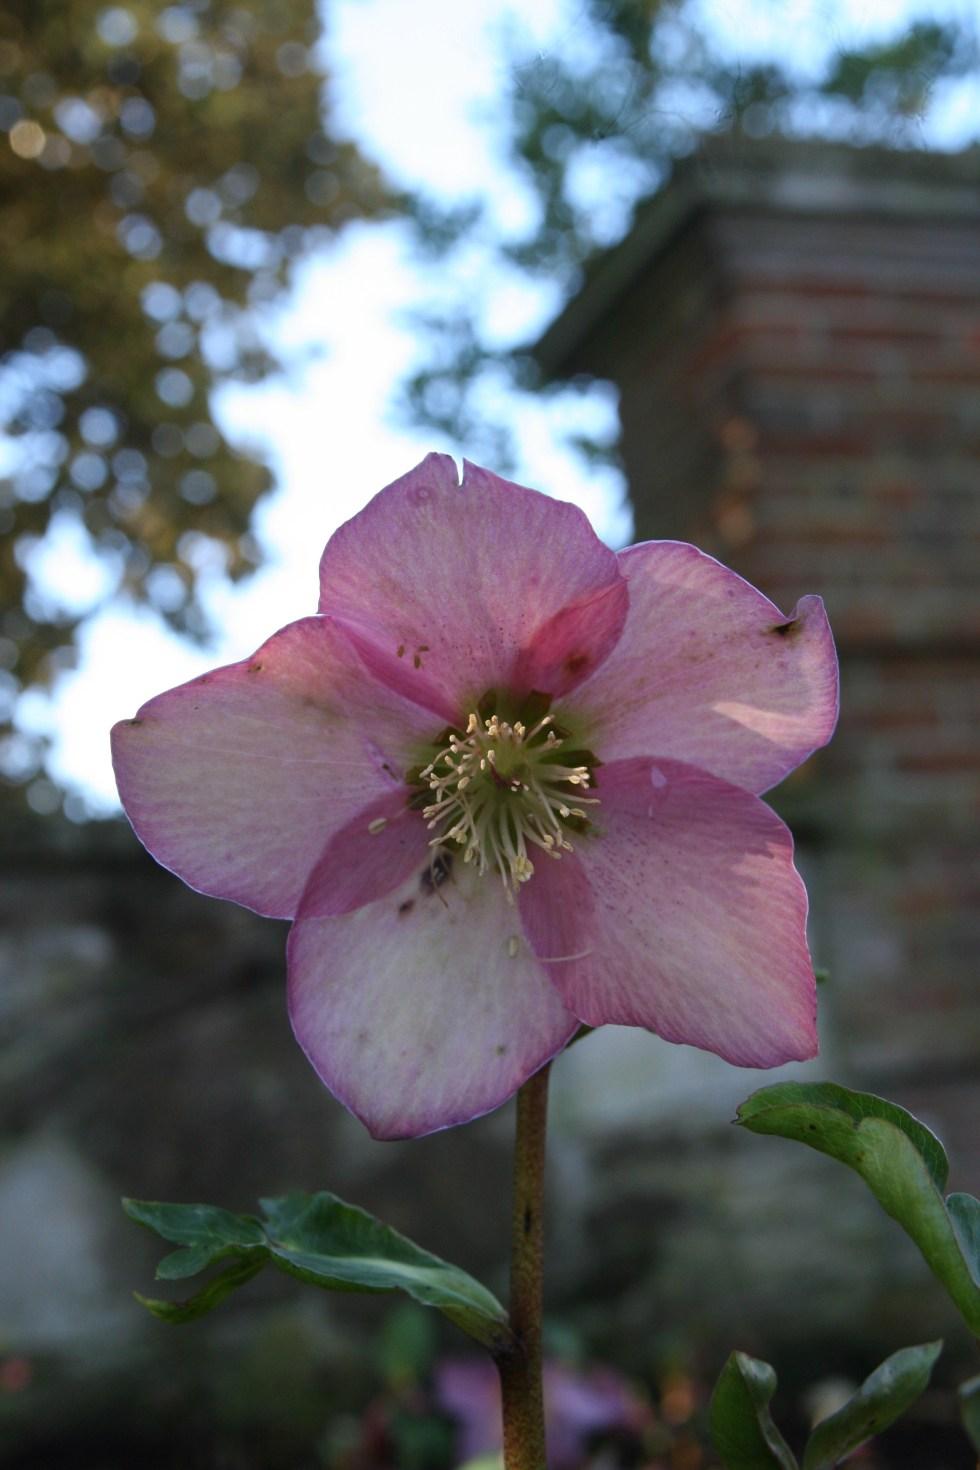 helleborus walbarton rosemary1 2 Plant of the week Helleborus x hybridus Walbertons Rosemary Walhero